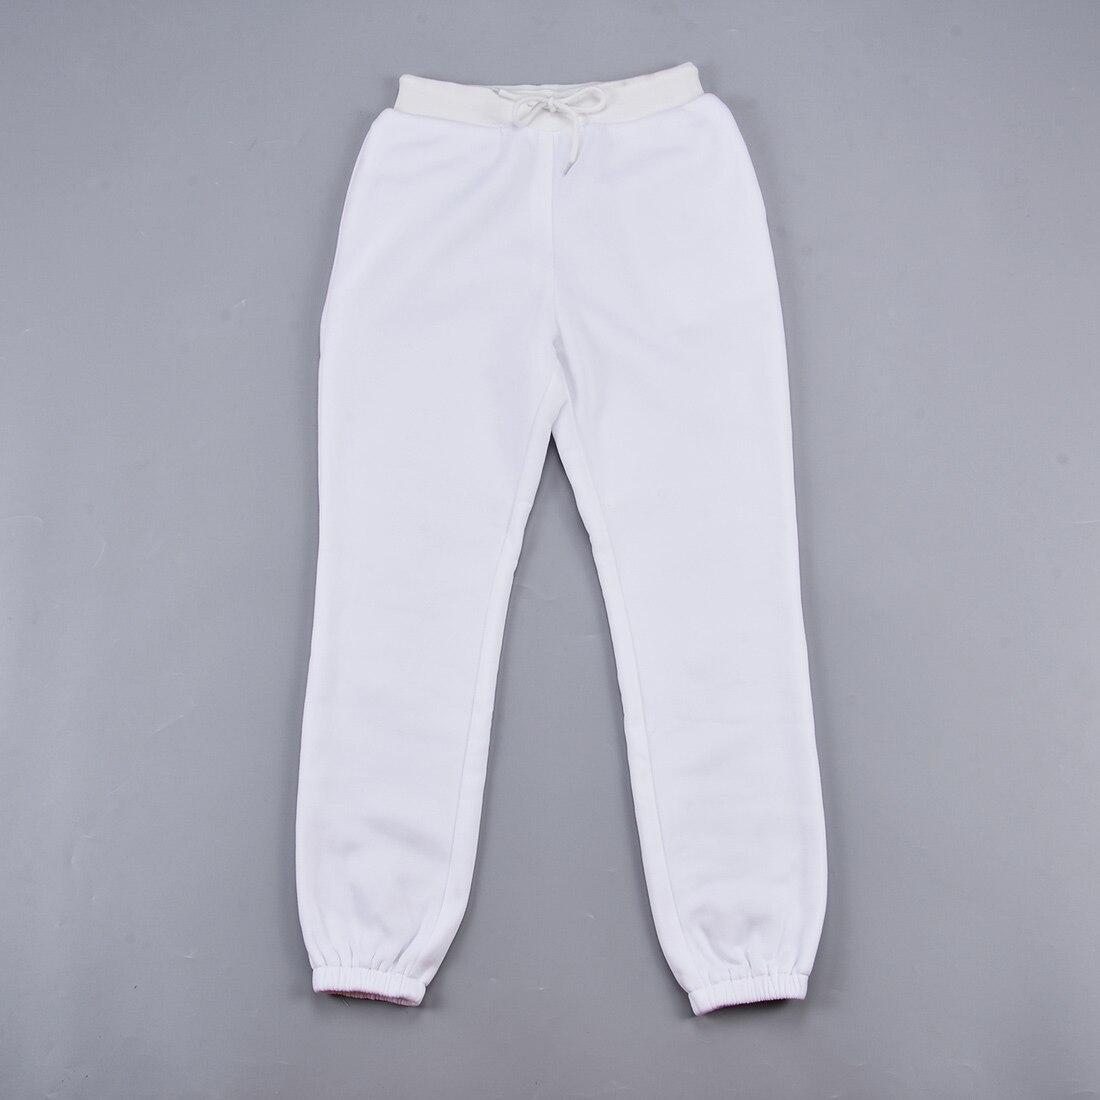 ANUFER Ni/ños Ni/ñas 2 Piezas Casual Set de Ropa Chandal Manga Larga Algod/ón Su/éter Pantalones